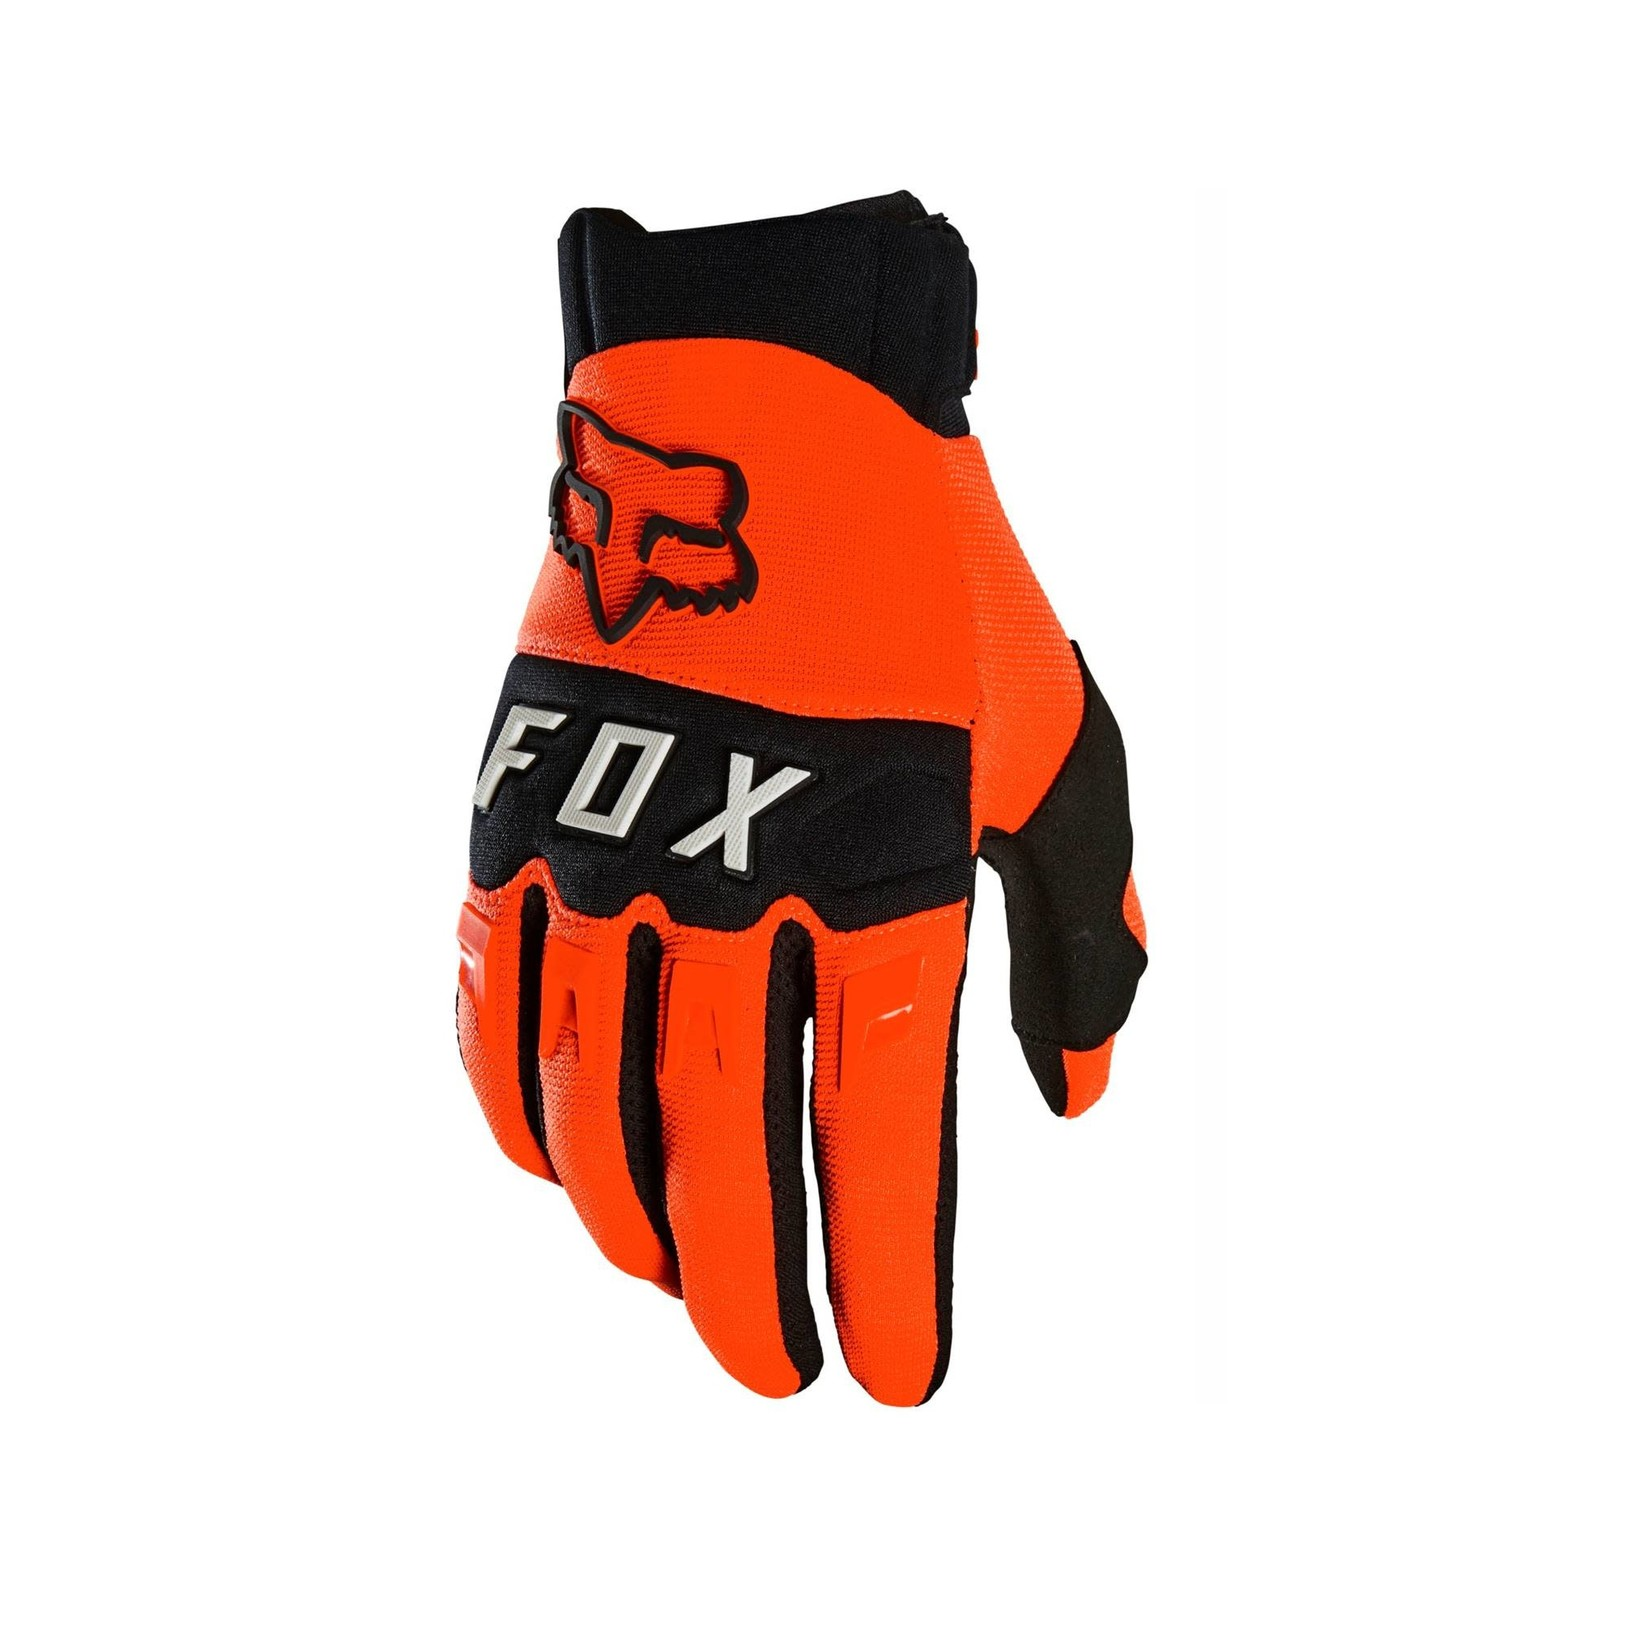 Fox Dirtpaw Mountain Bike Glove Orange/Black